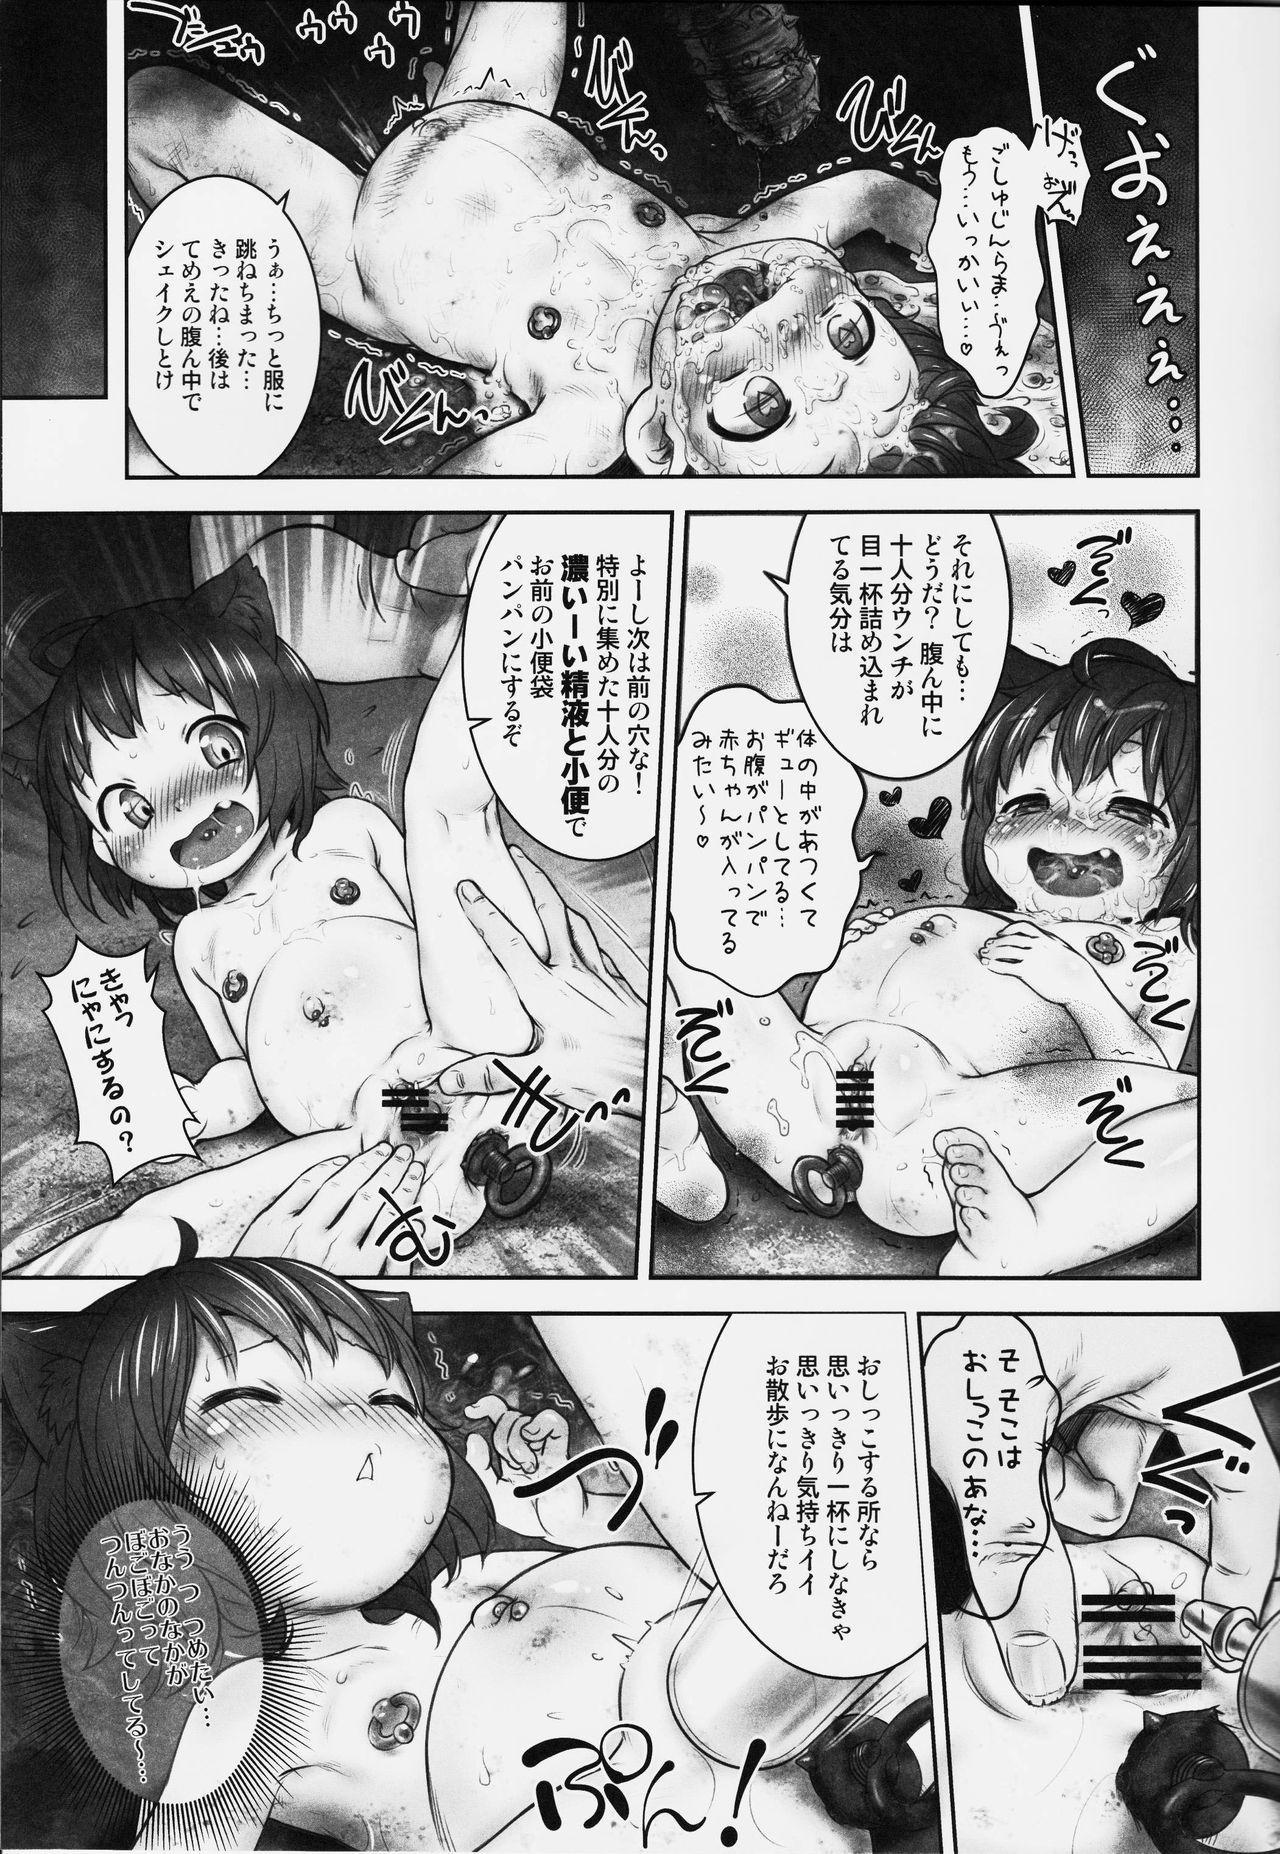 Kankin no Neko - Juurin Hen 7